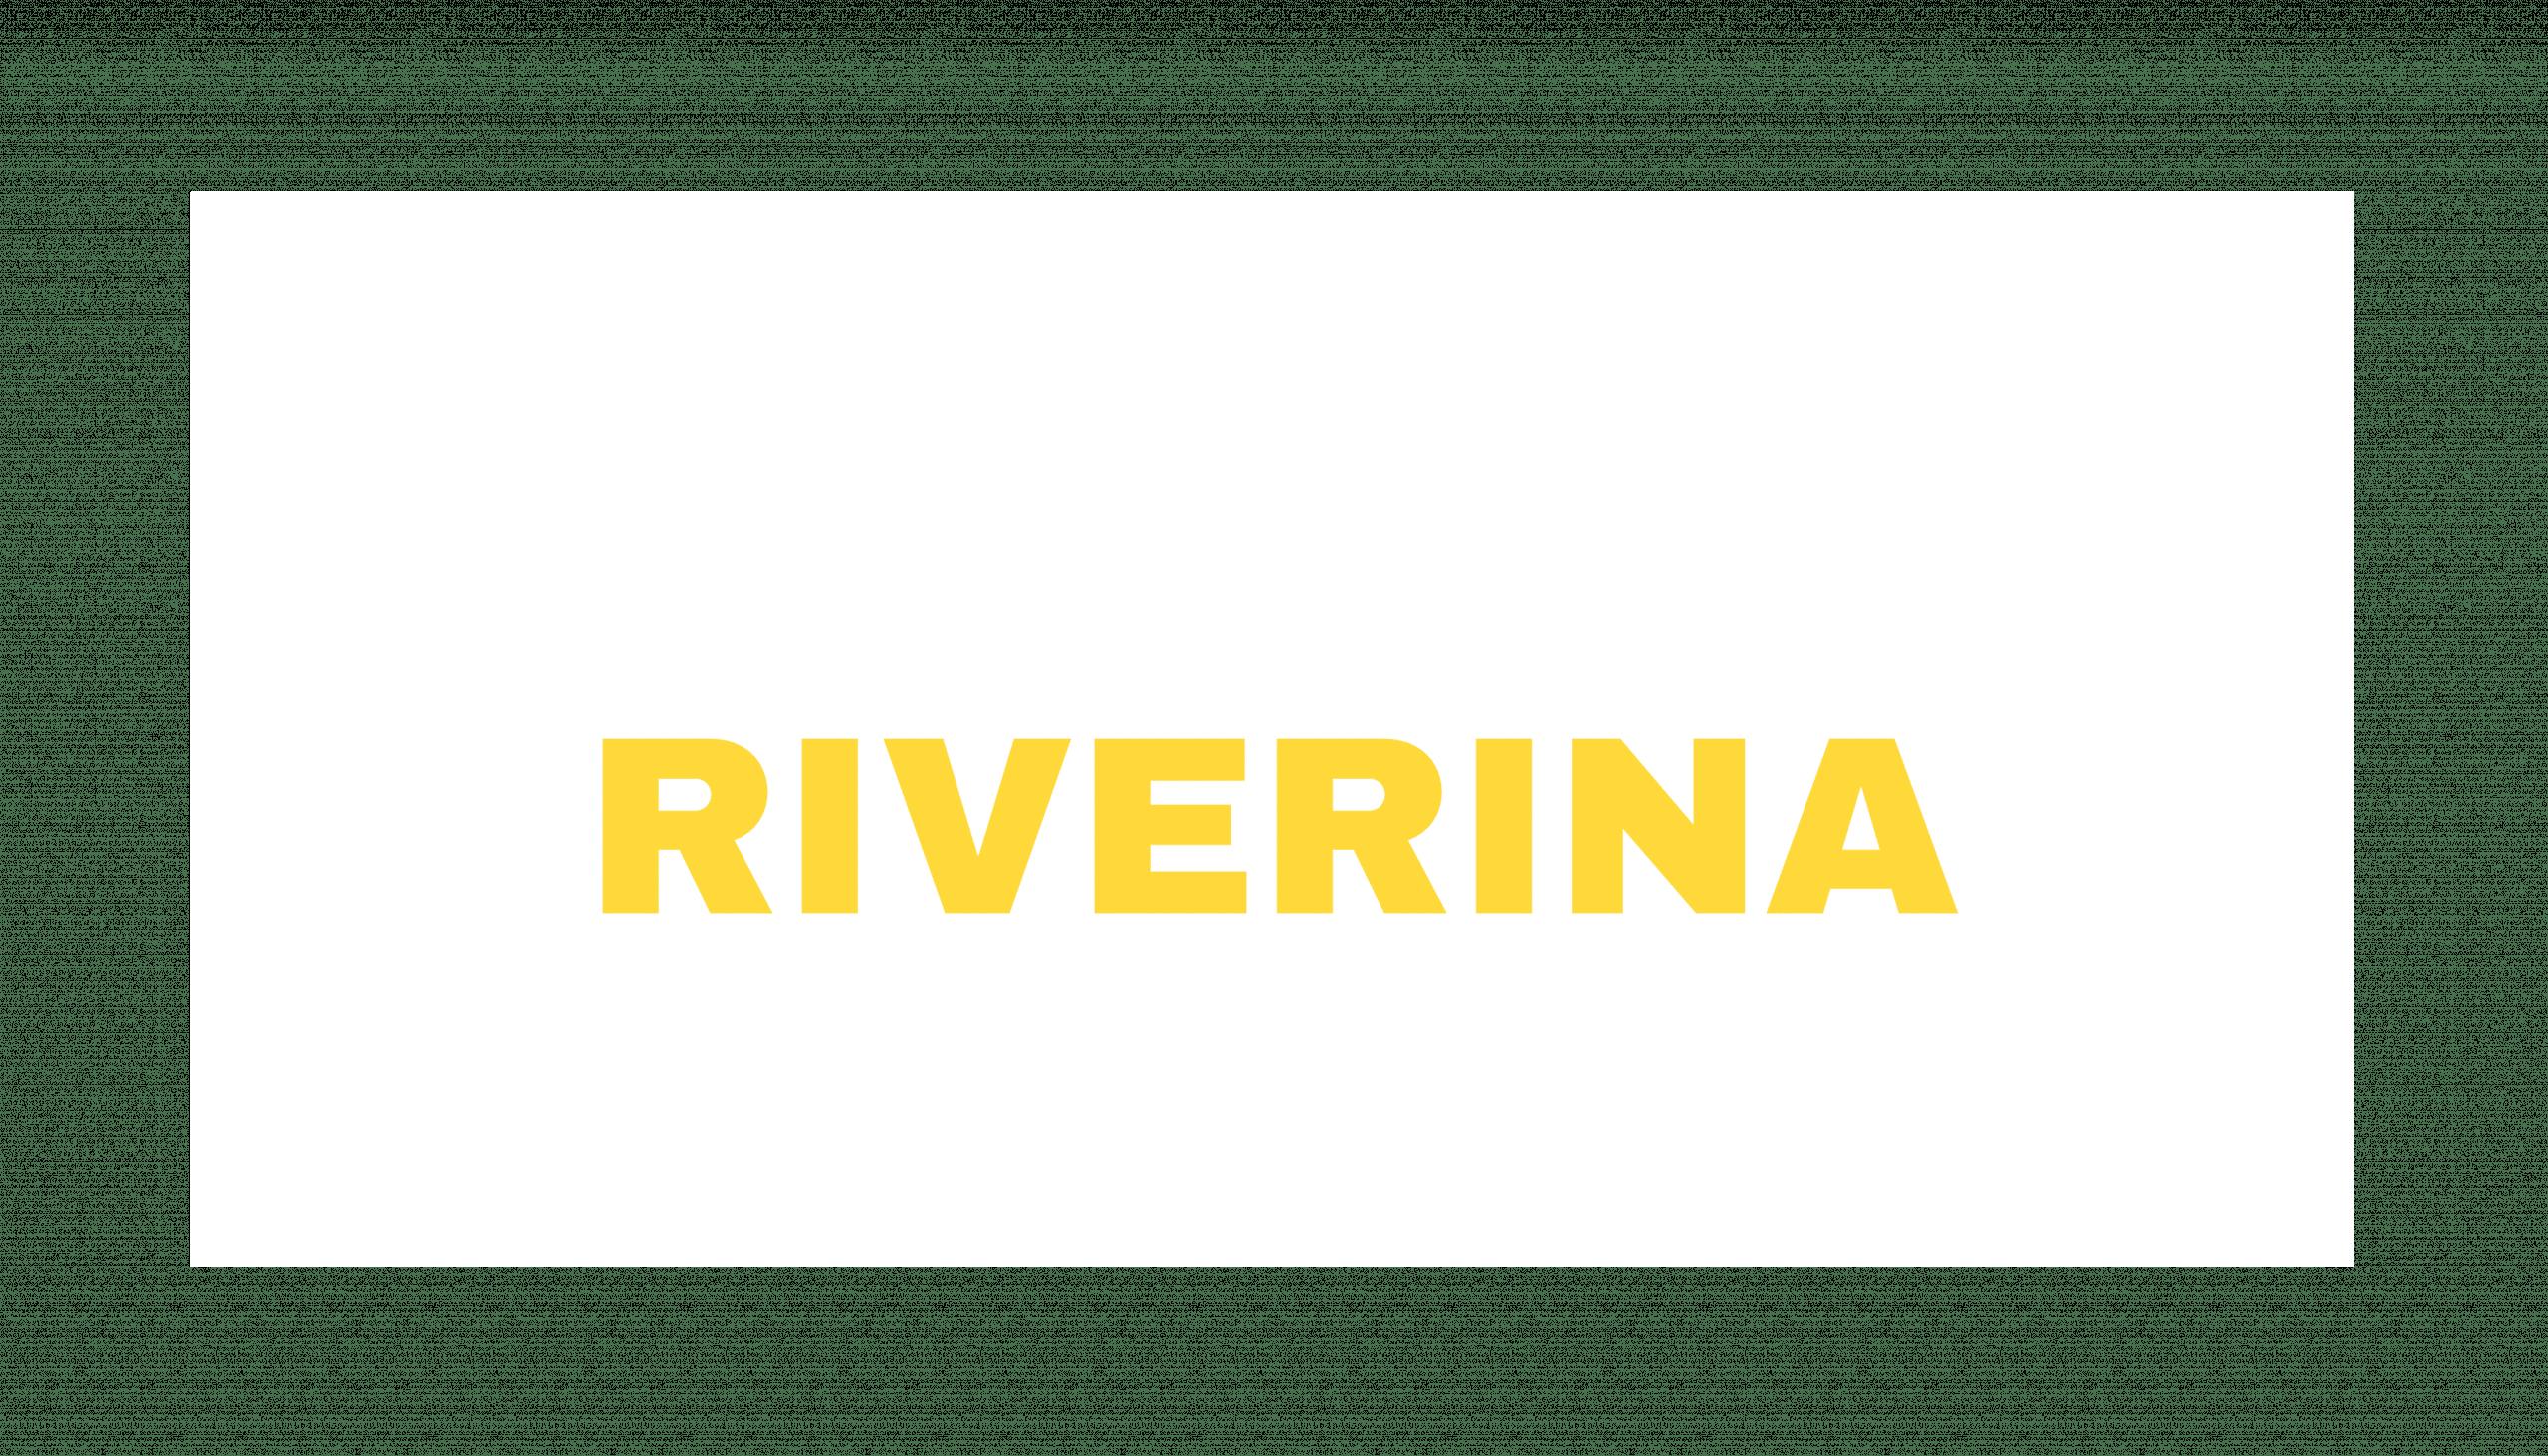 Riverina Skilled Occupation List